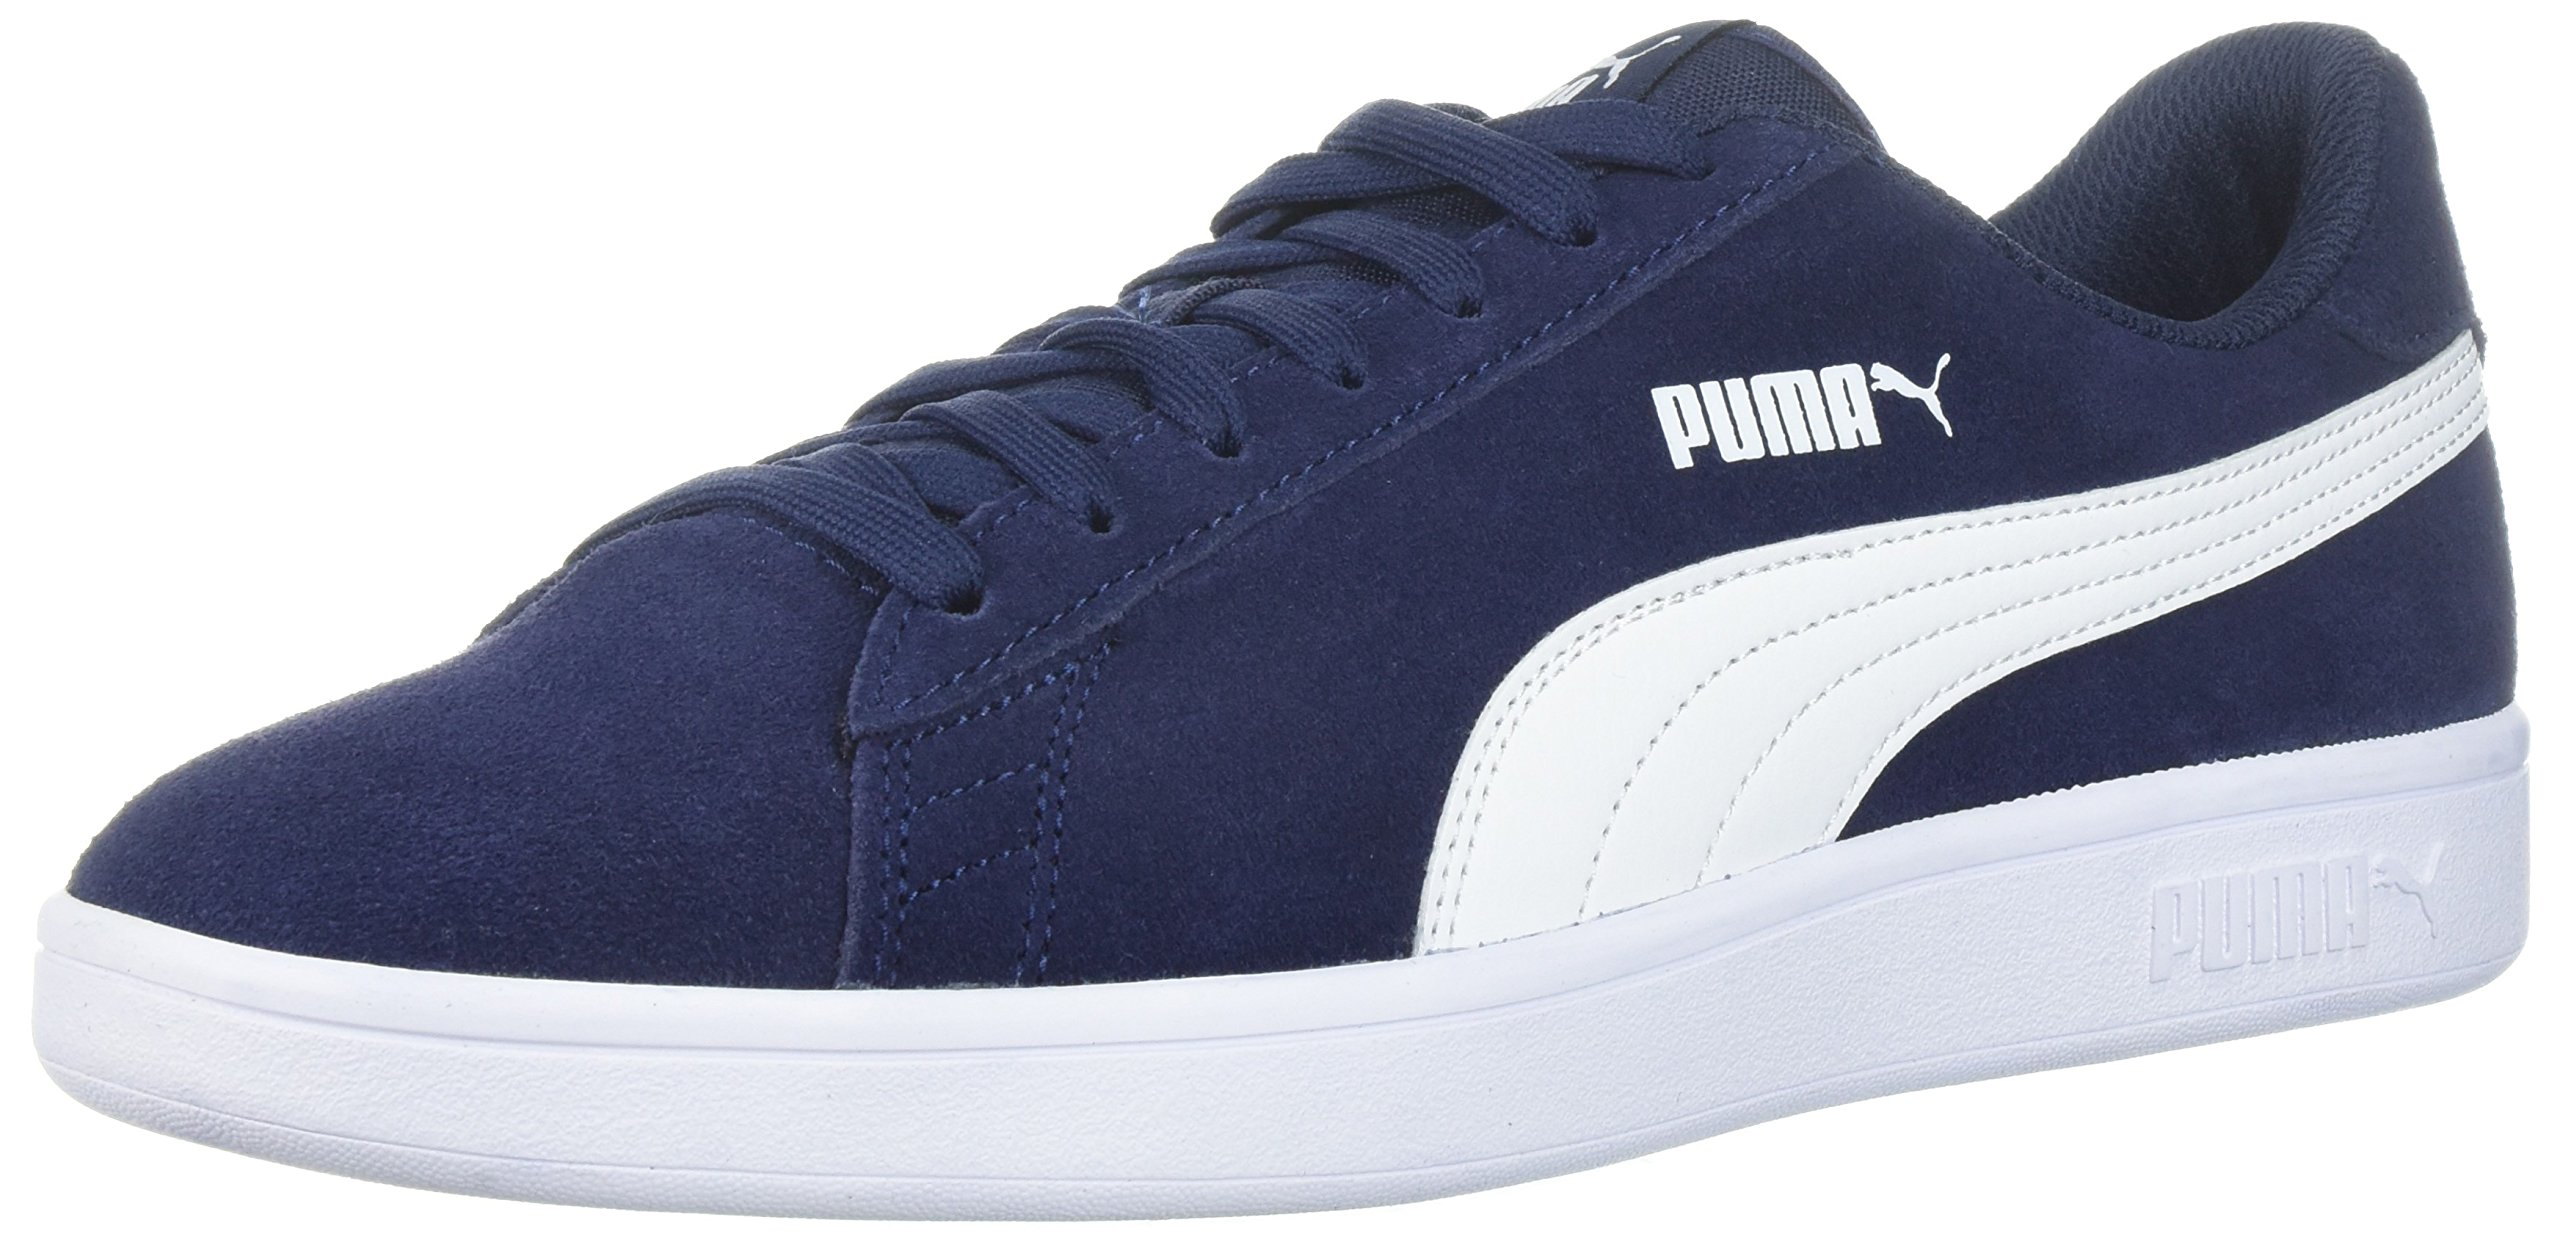 PUMA Men's Smash v2 Sneaker, Peacoat White, 12 M US